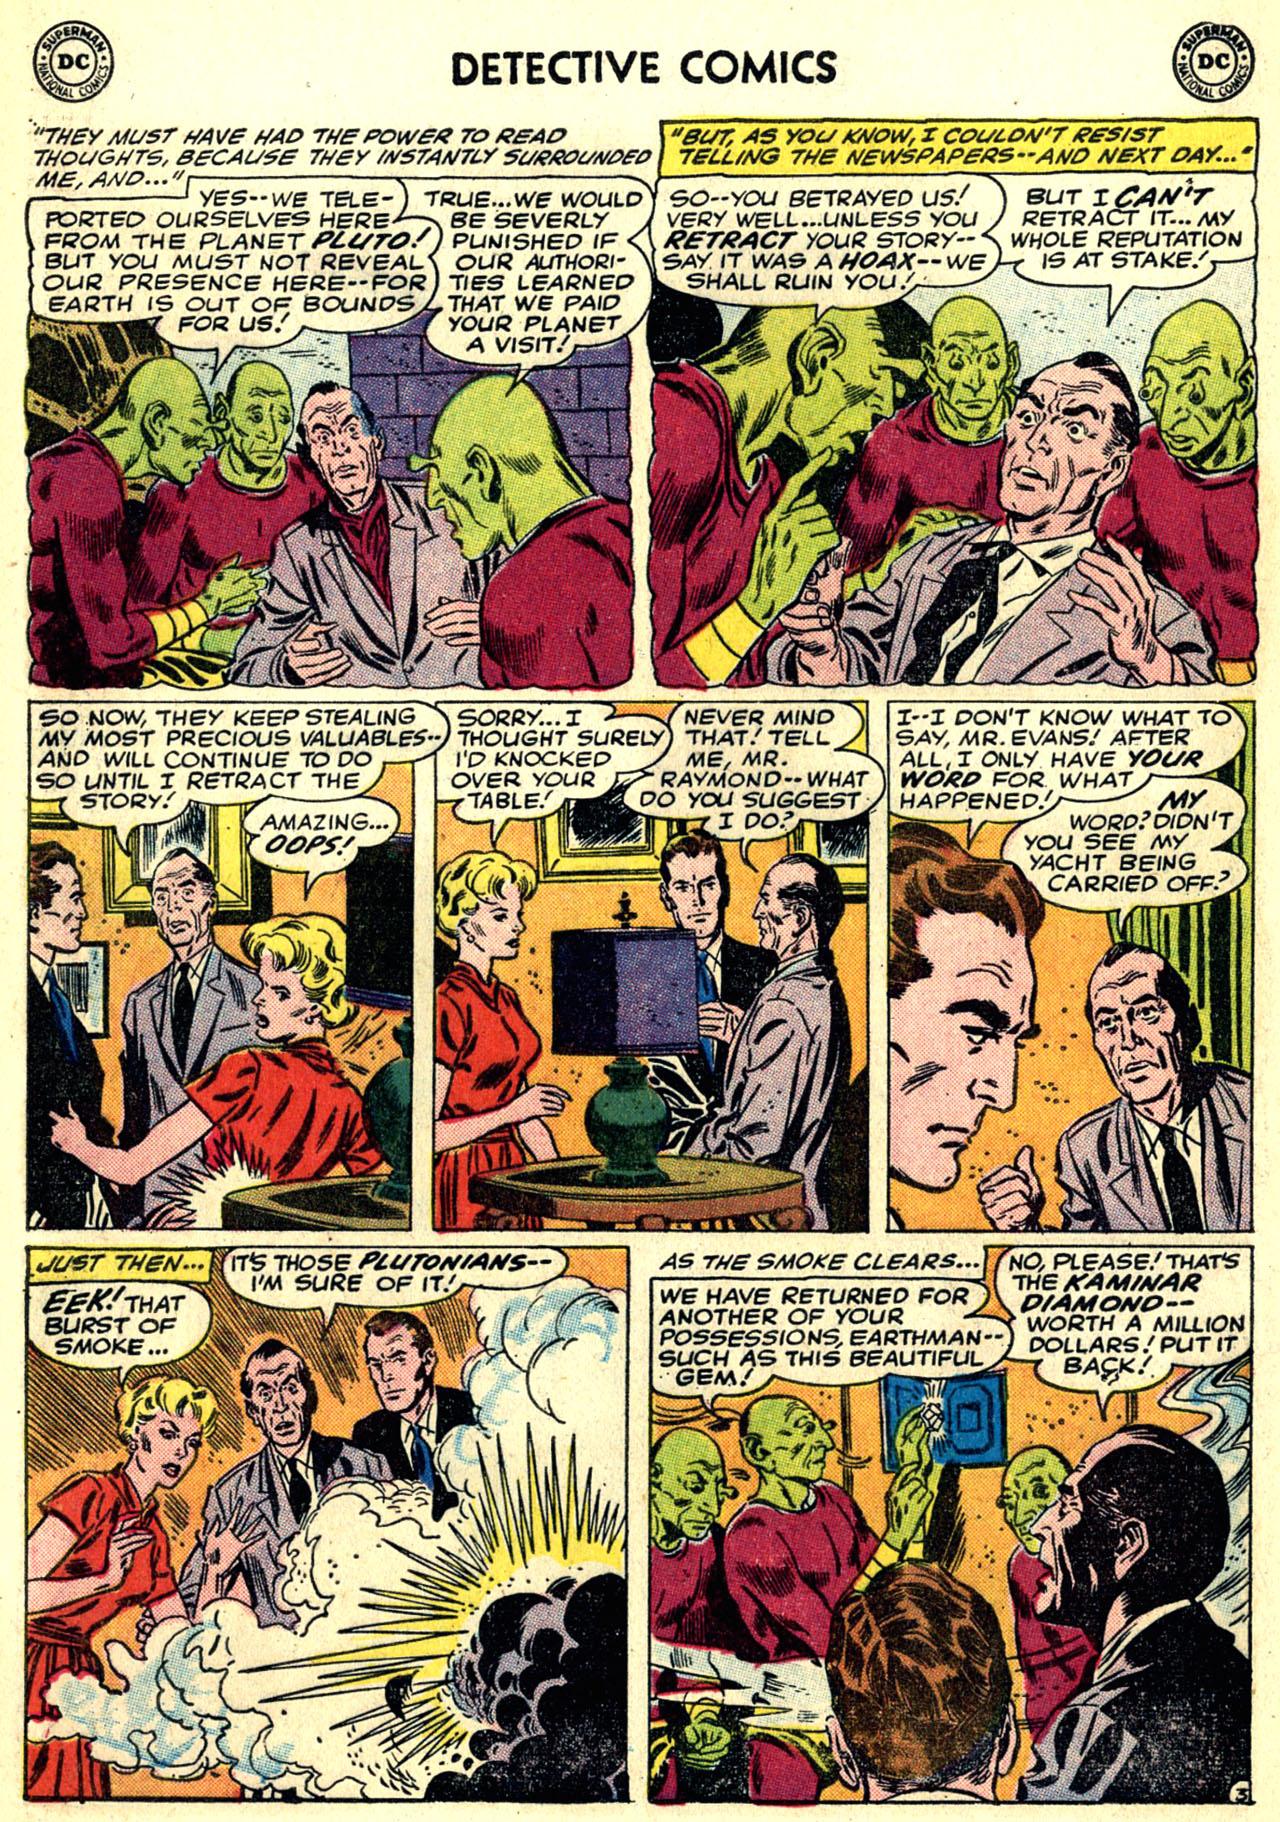 Detective Comics (1937) 273 Page 19